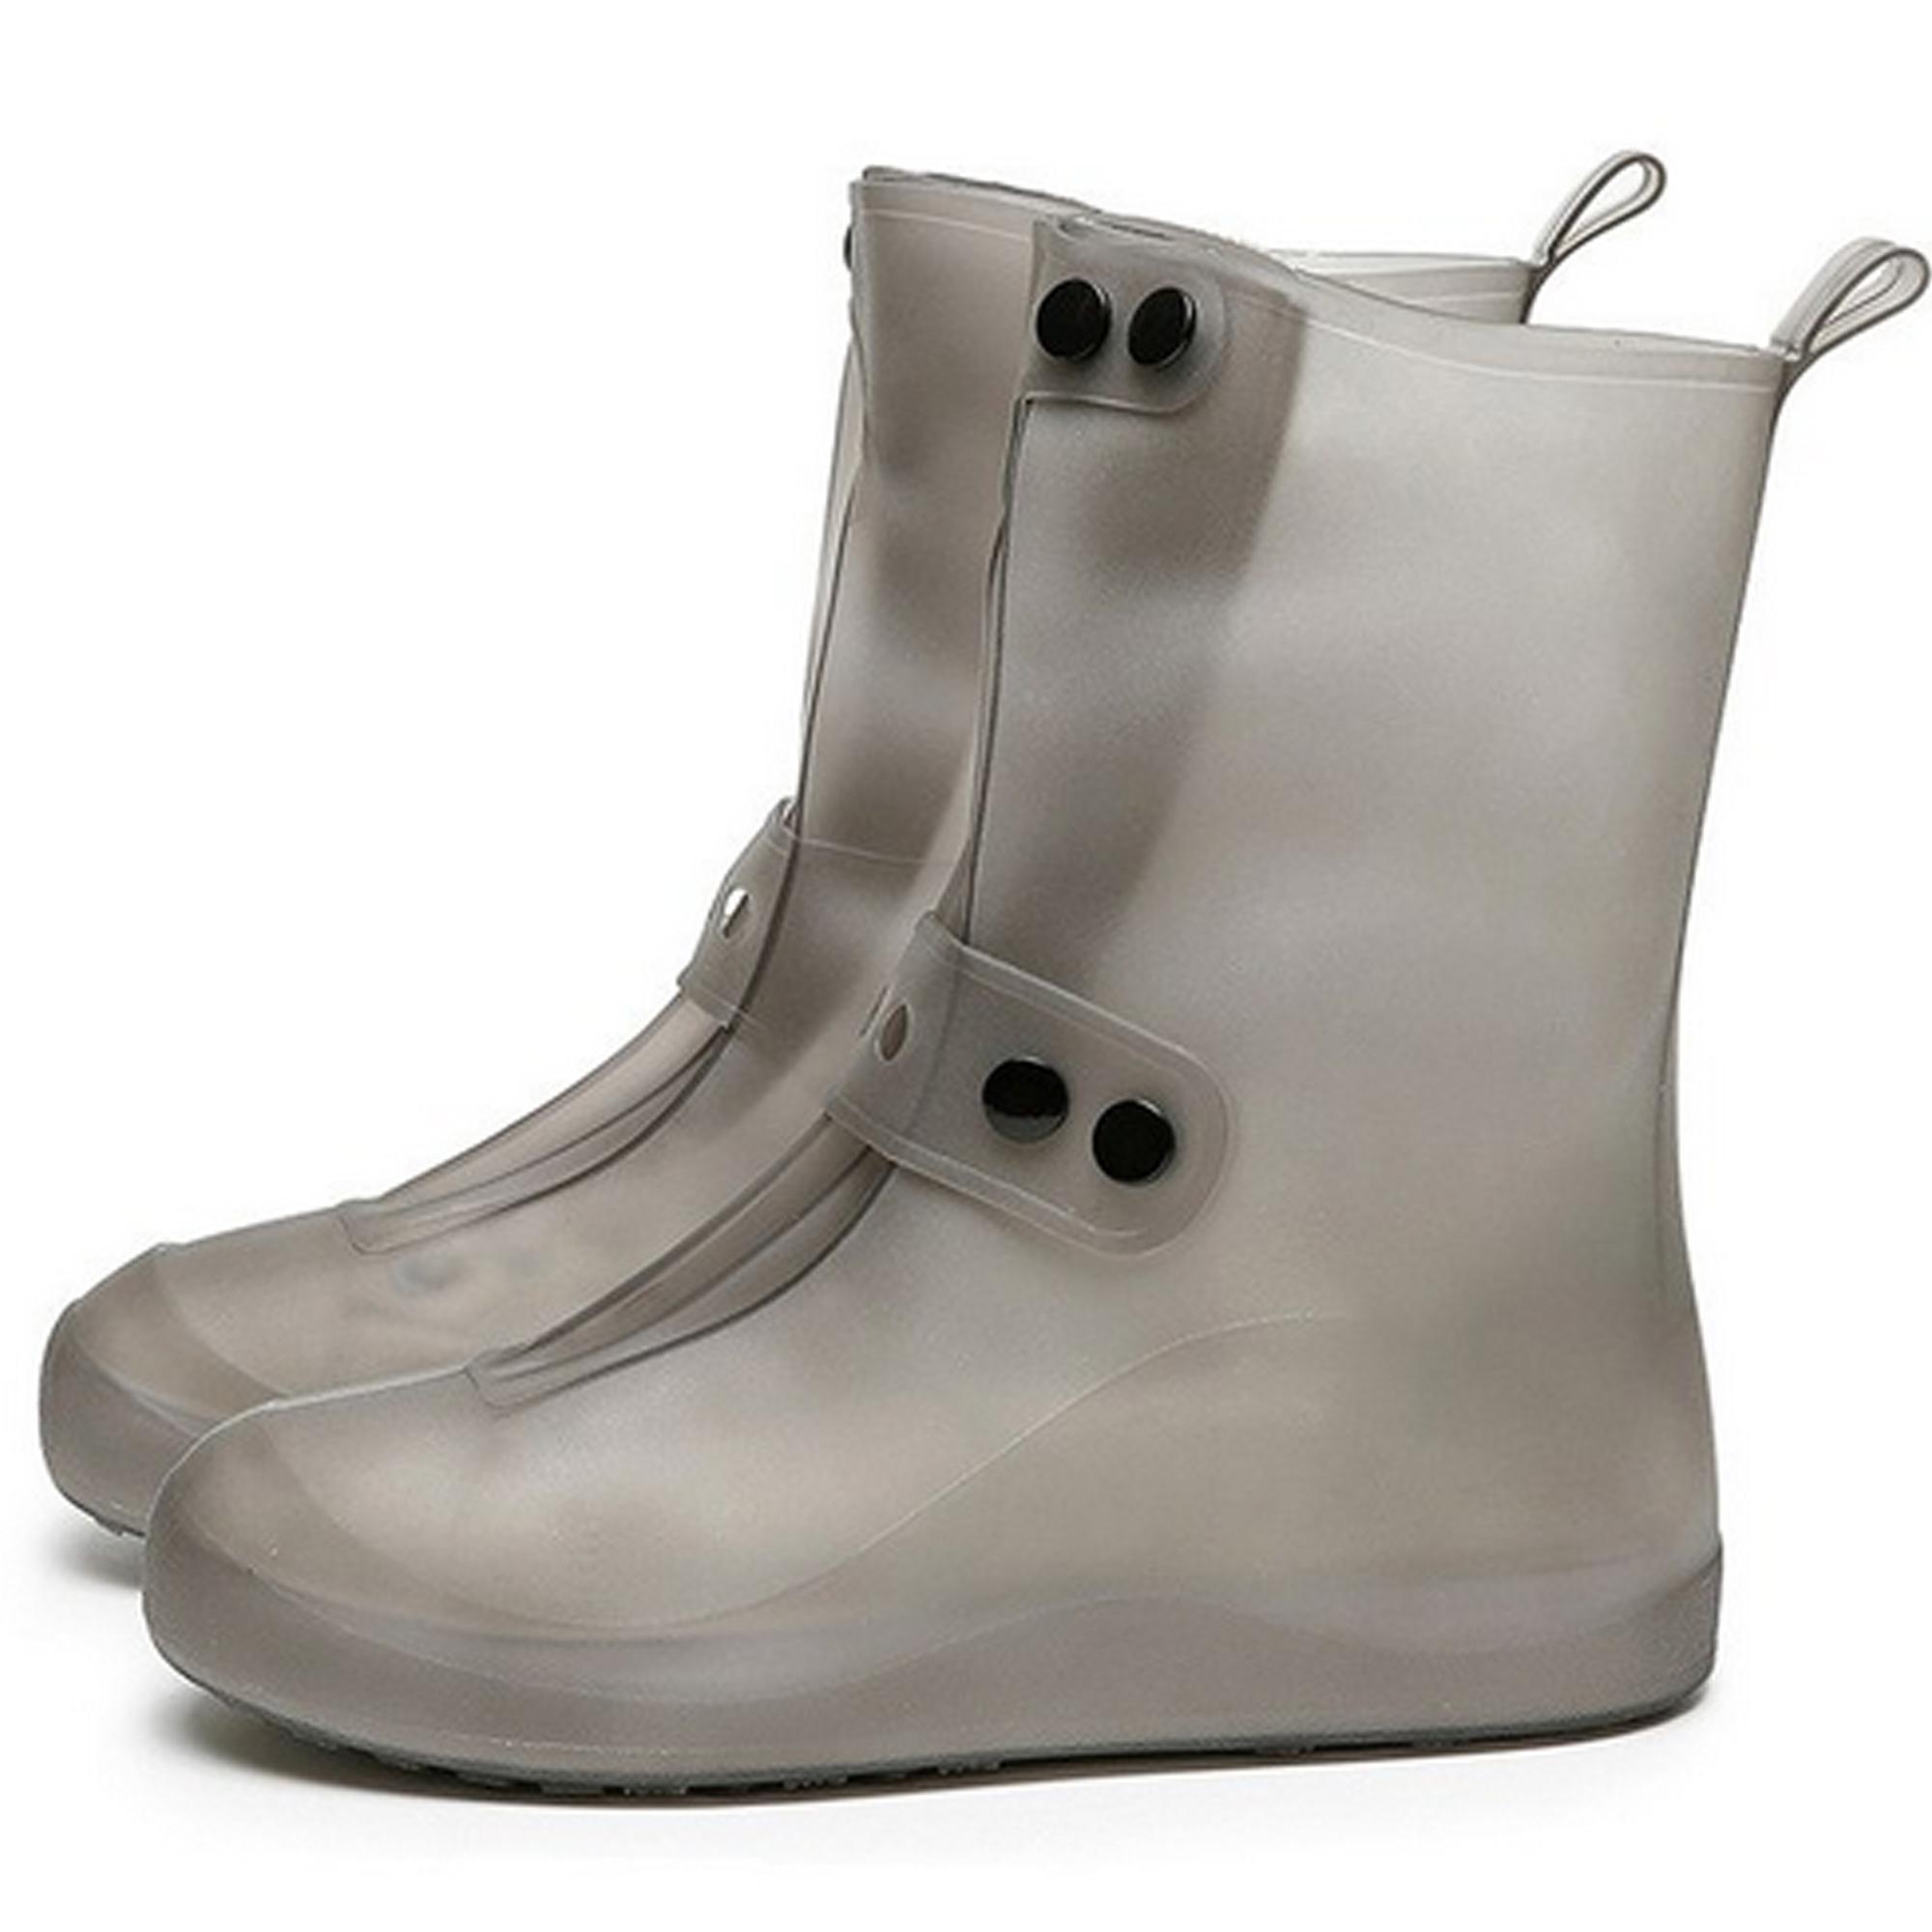 106562d92ebe7 Boots for Men - Buy Men's Boots Online In Bangladesh - Daraz.com.bd